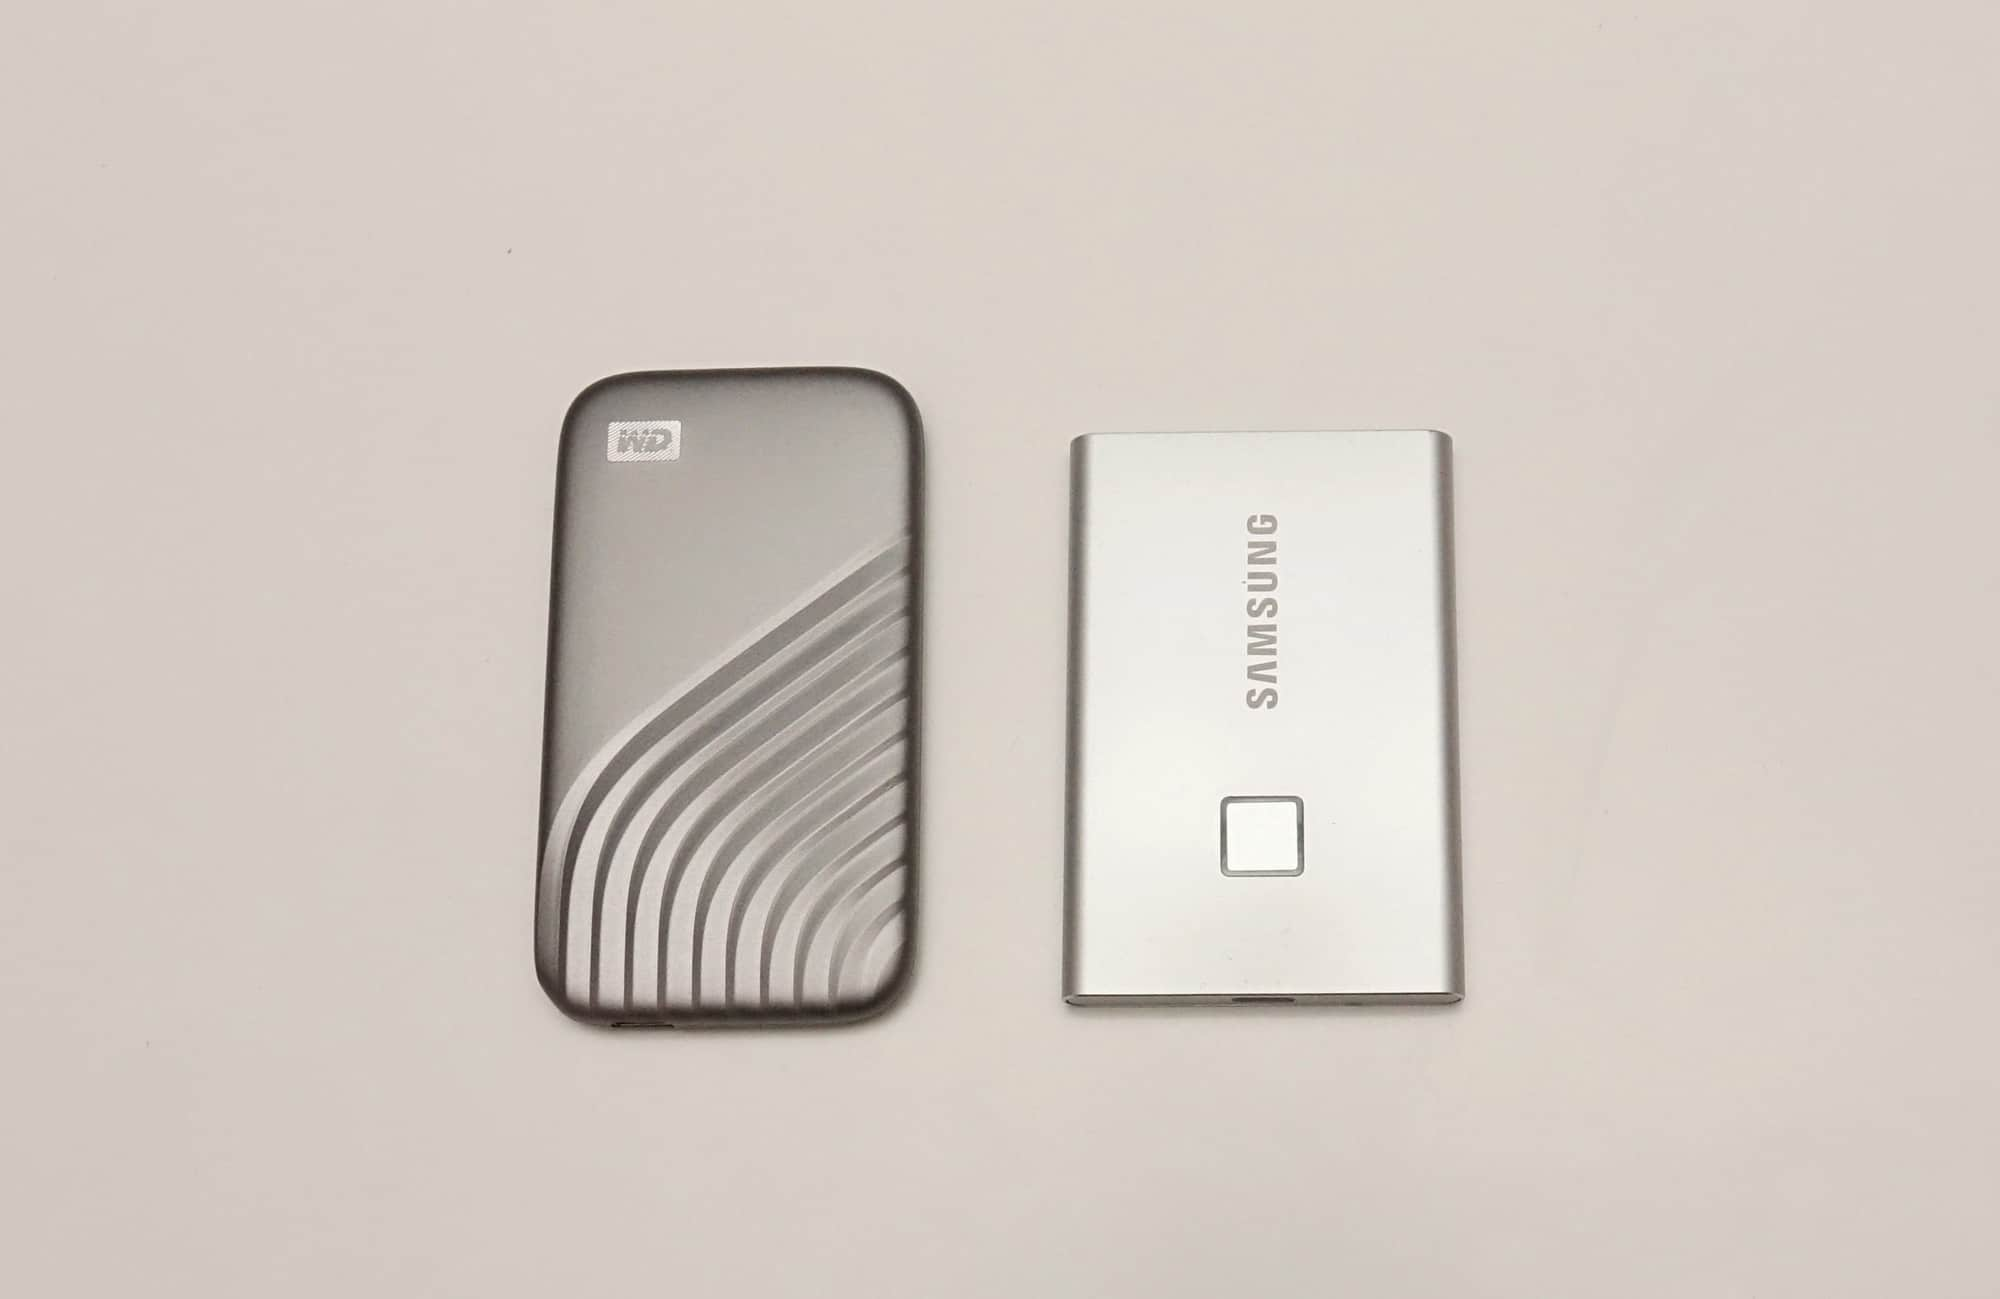 WD My Passport SSD vs Samsung T7 Touch SSD